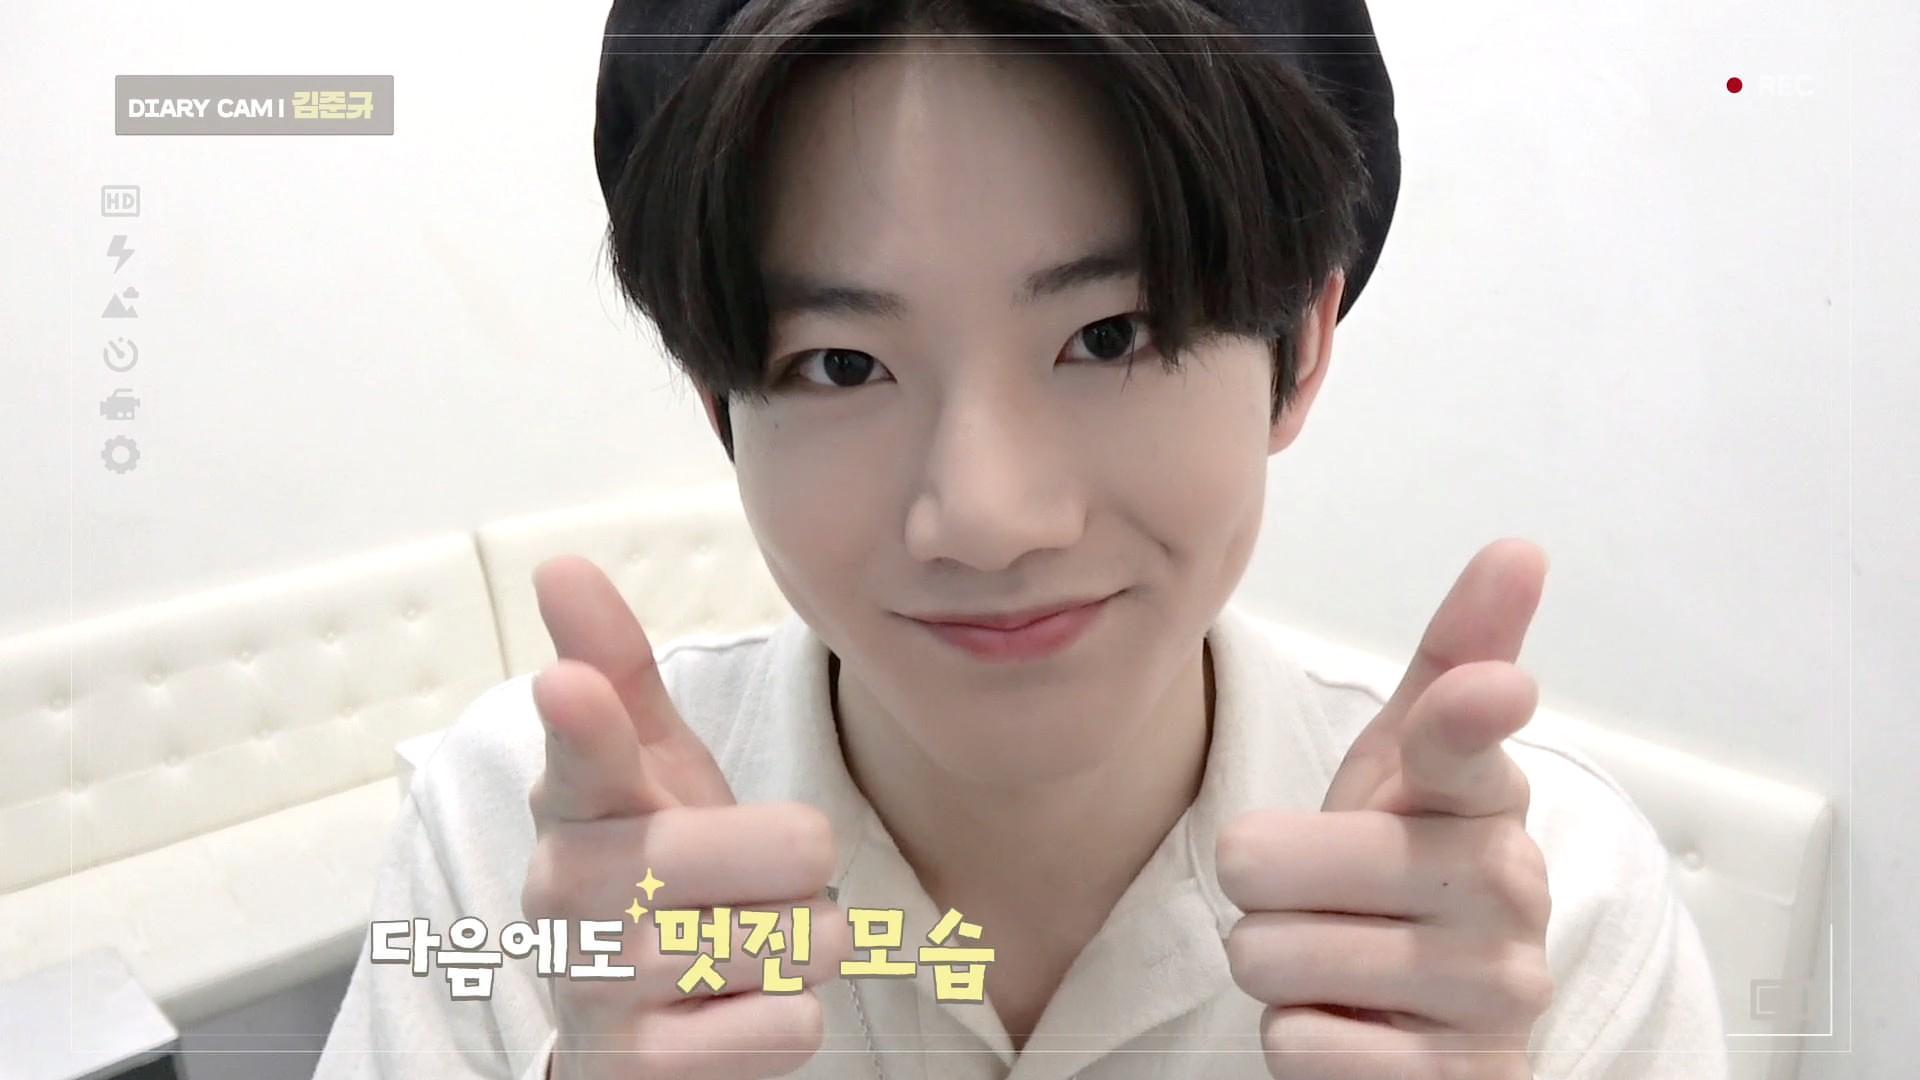 [DIARY CAM 5] 김준규 <KIM JUNKYU> l YG보석함